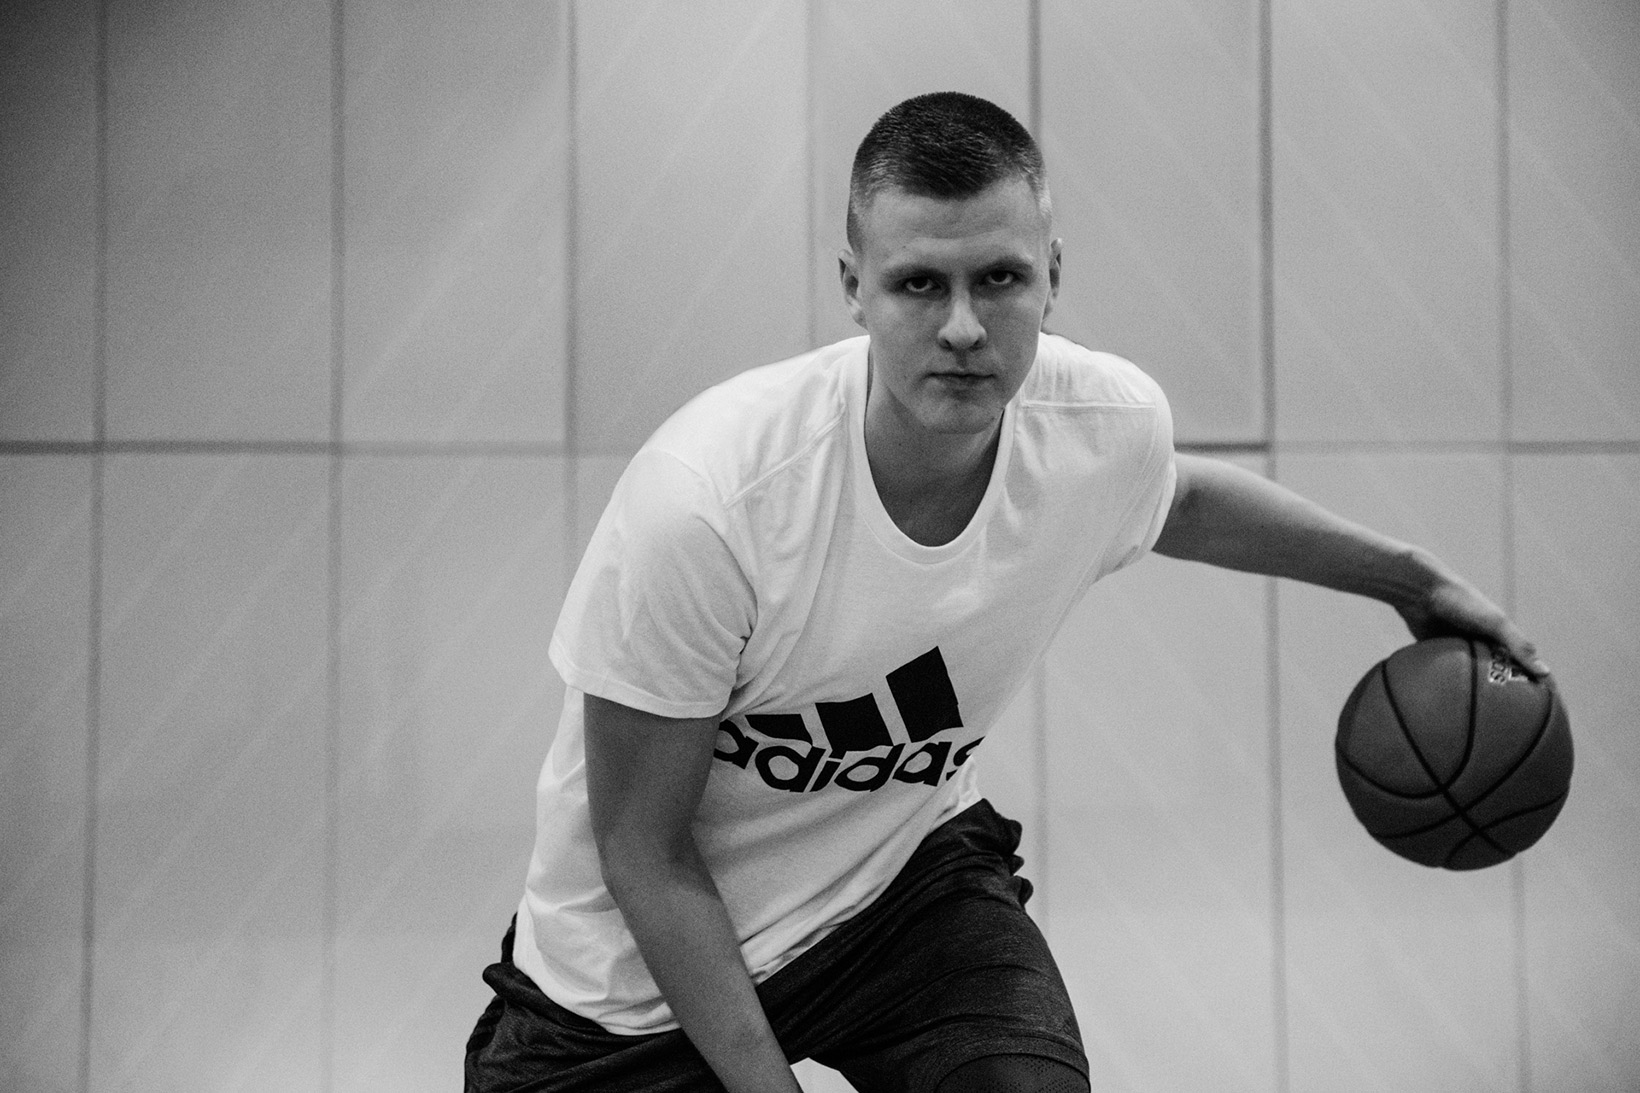 New York Knicks' Standout, Kristaps Porzingis, Leaves Nike for adidas